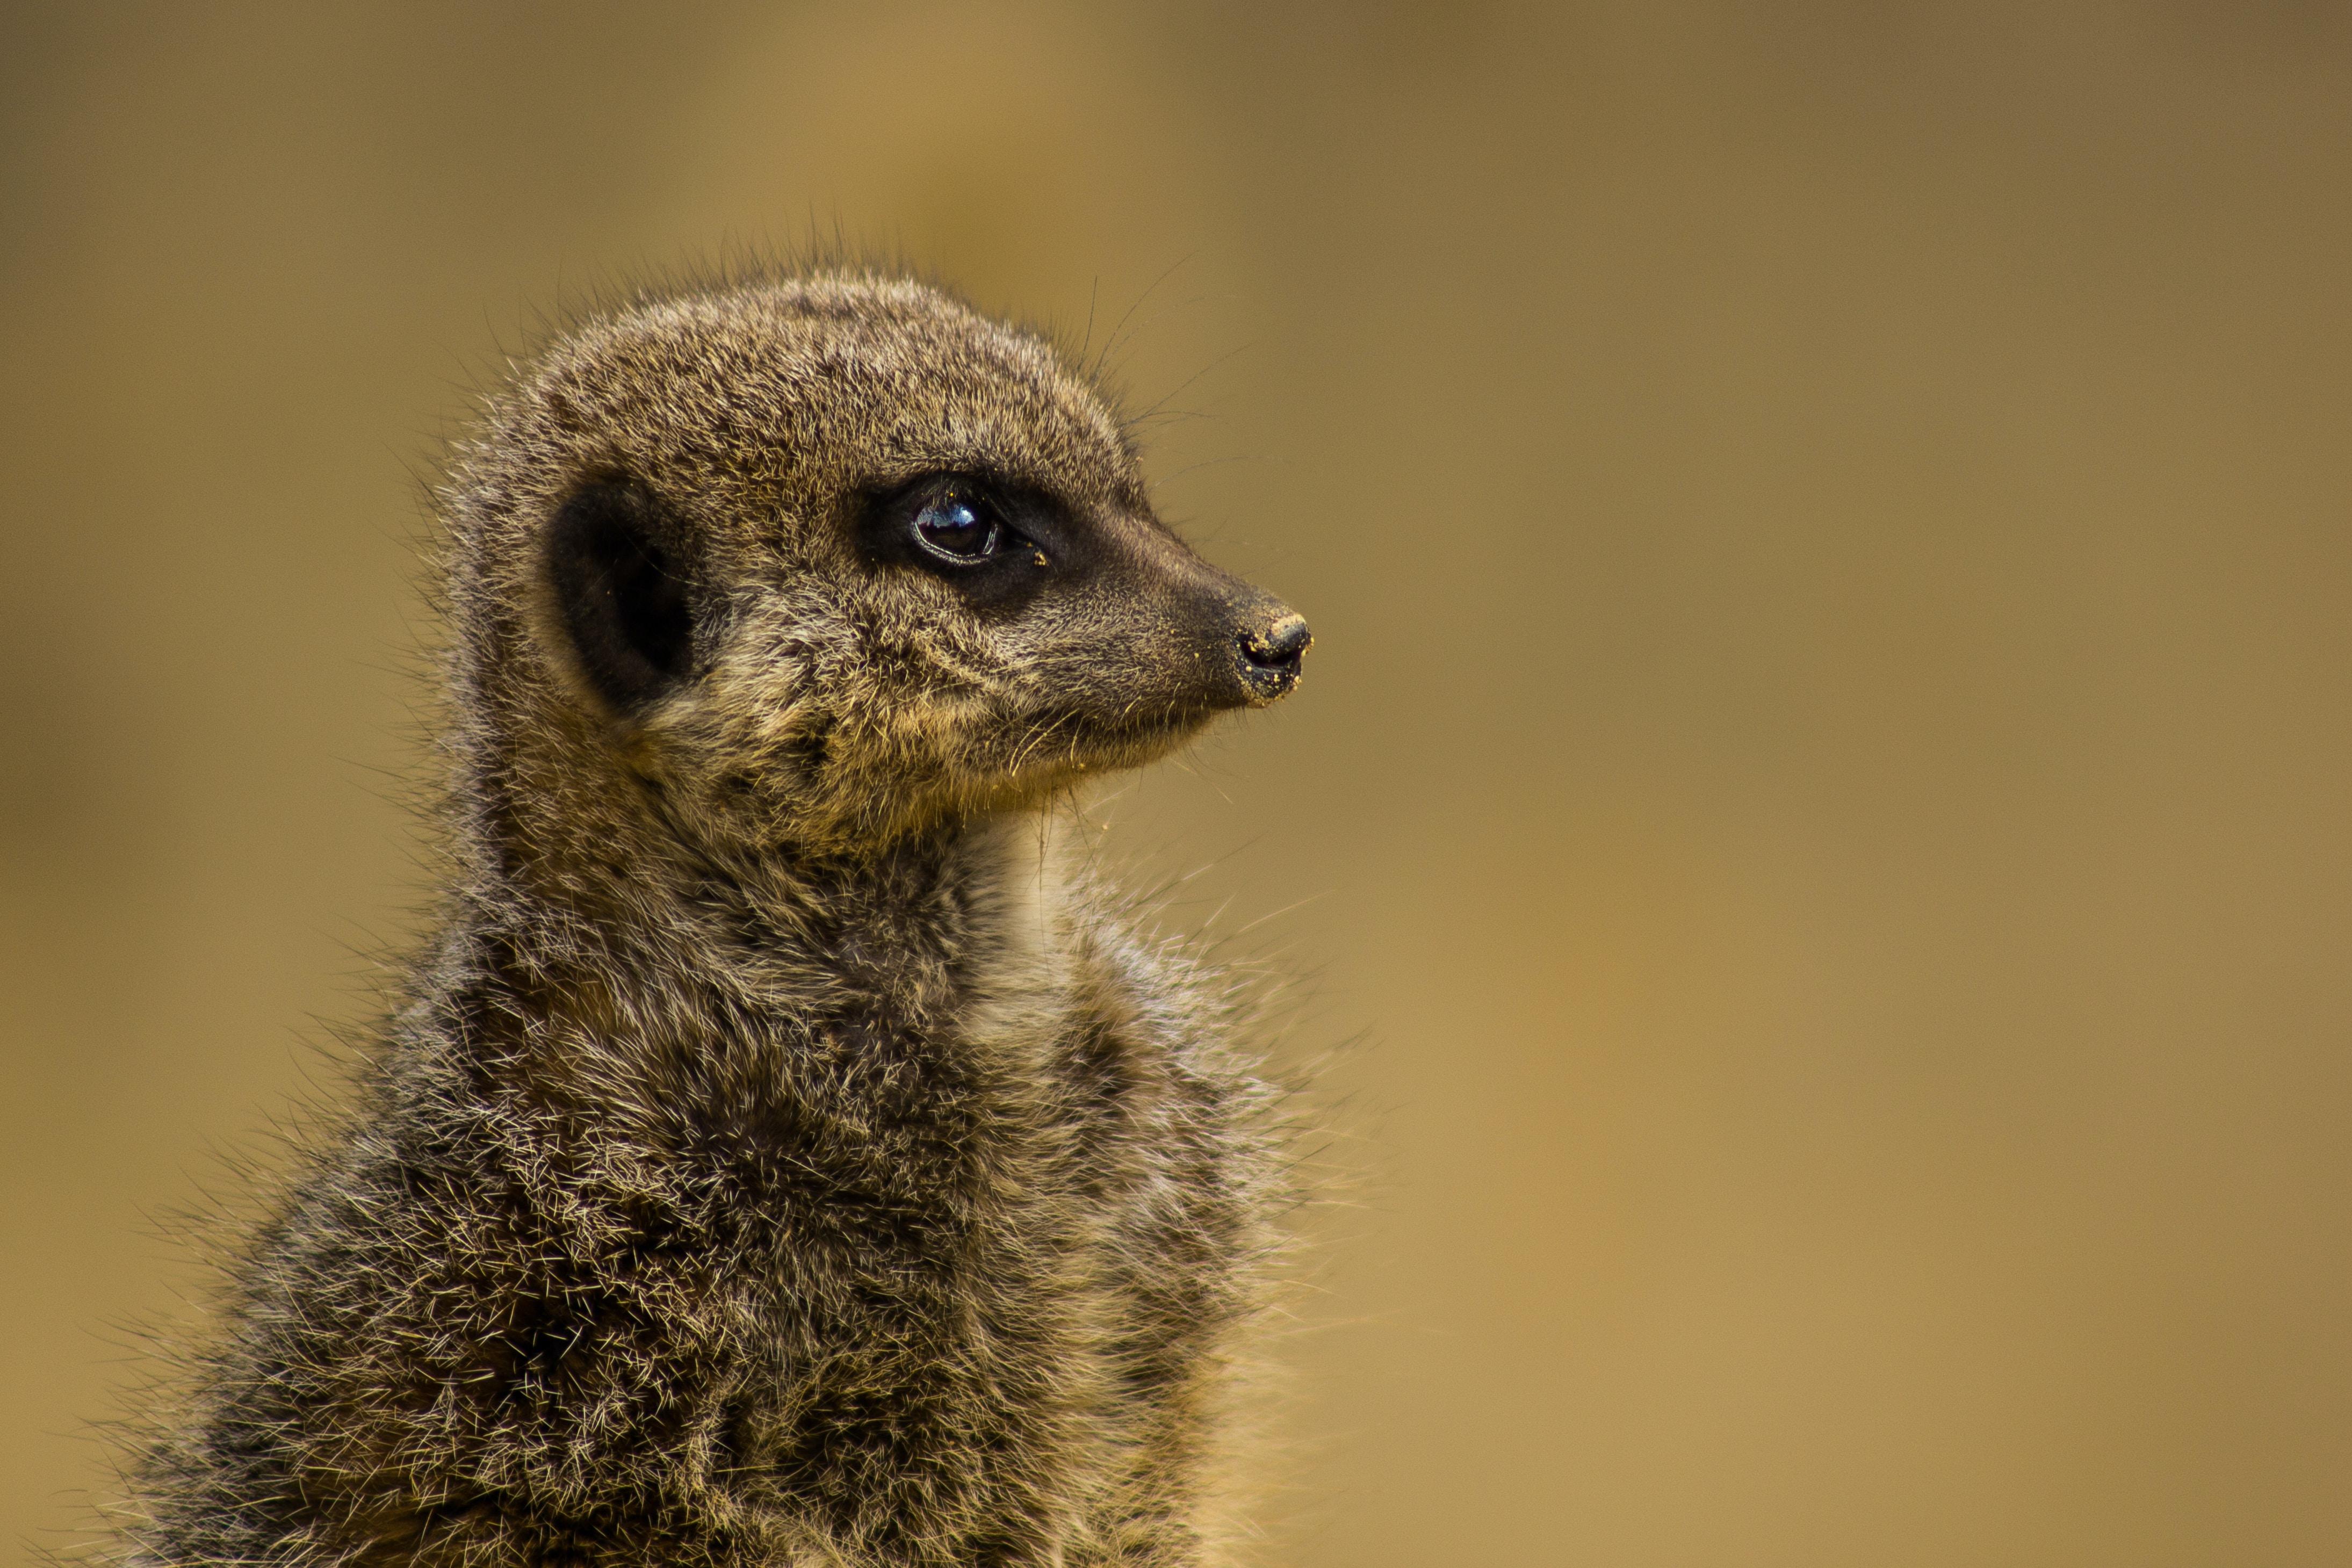 A meerkat with long coat